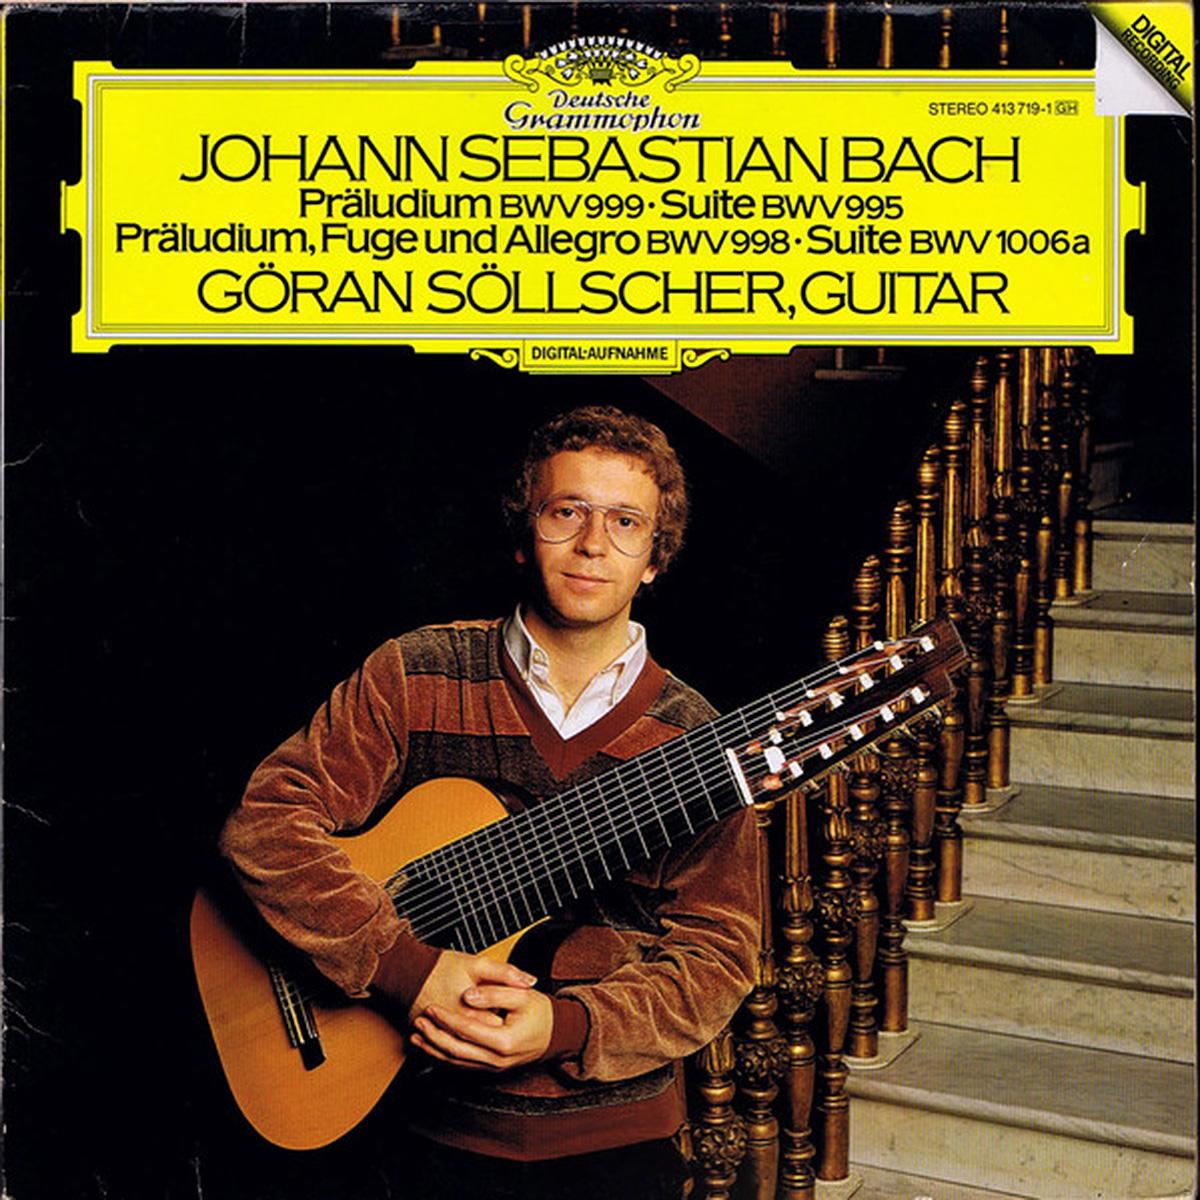 DGG 413 719 Bach Sollcher Praludium Suite BWV 995 998 999 1006 DGG Digital Aufnahme